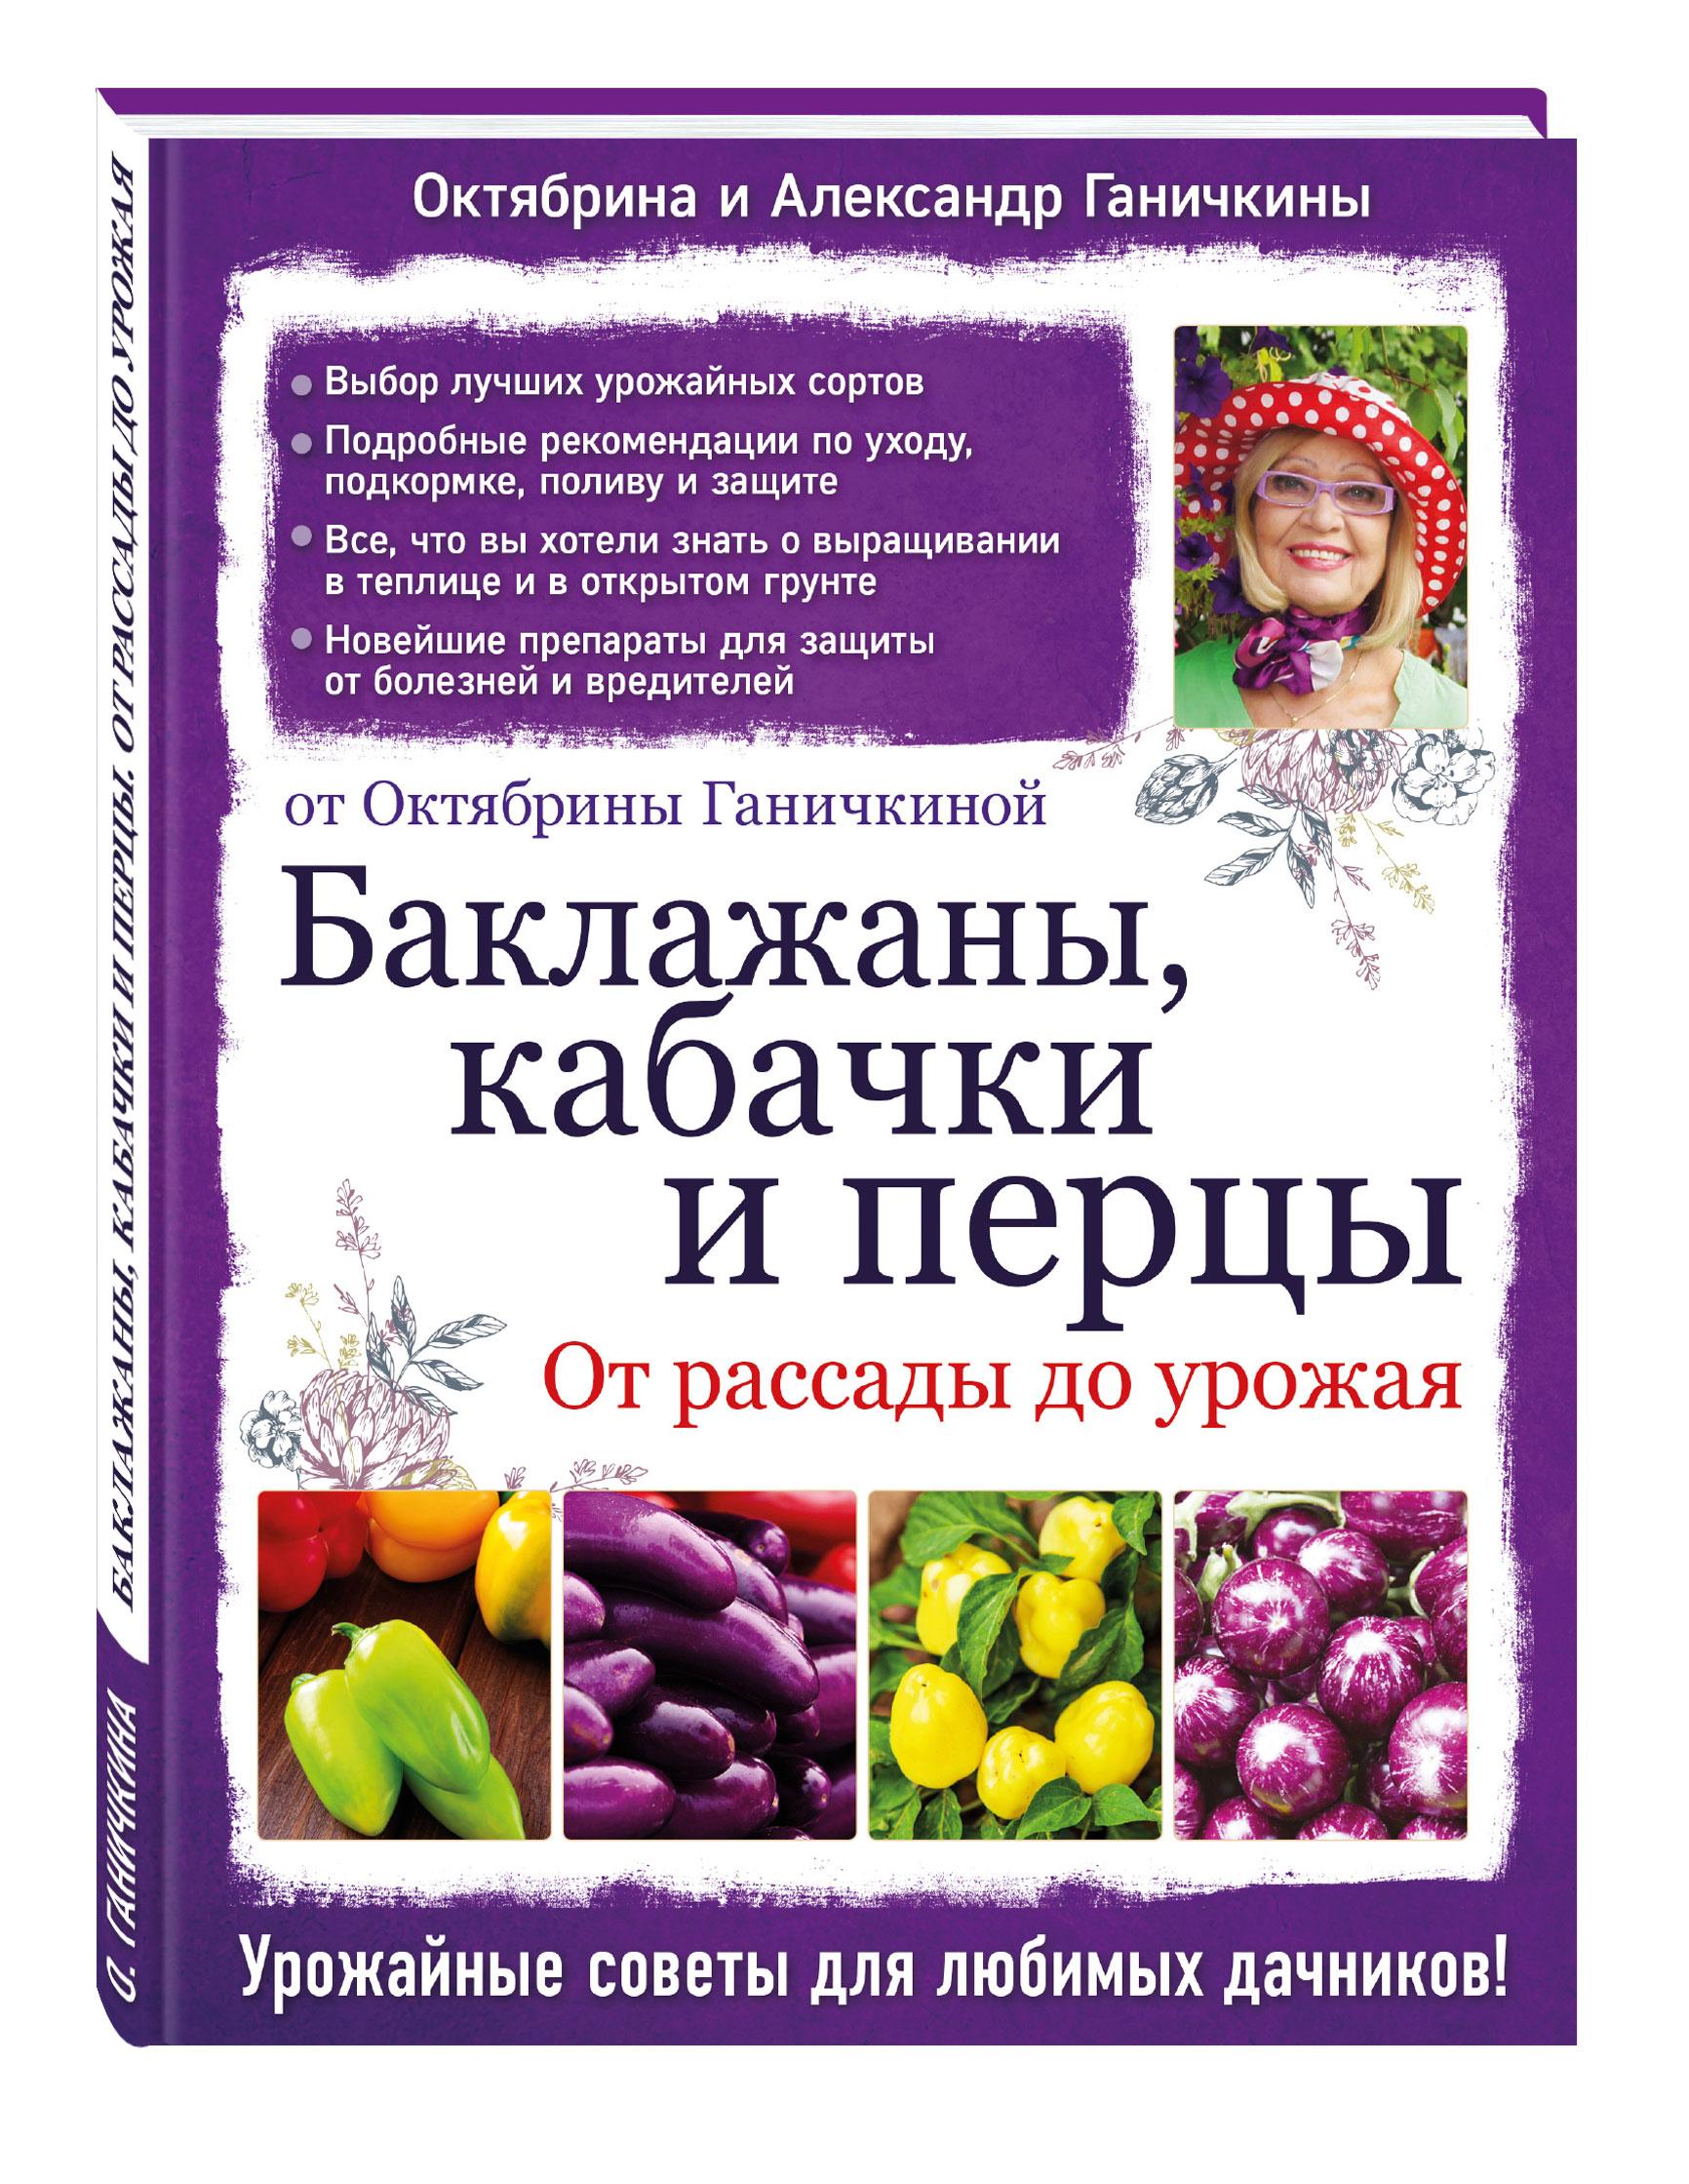 Баклажаны, кабачки и перцы. От рассады до урожая